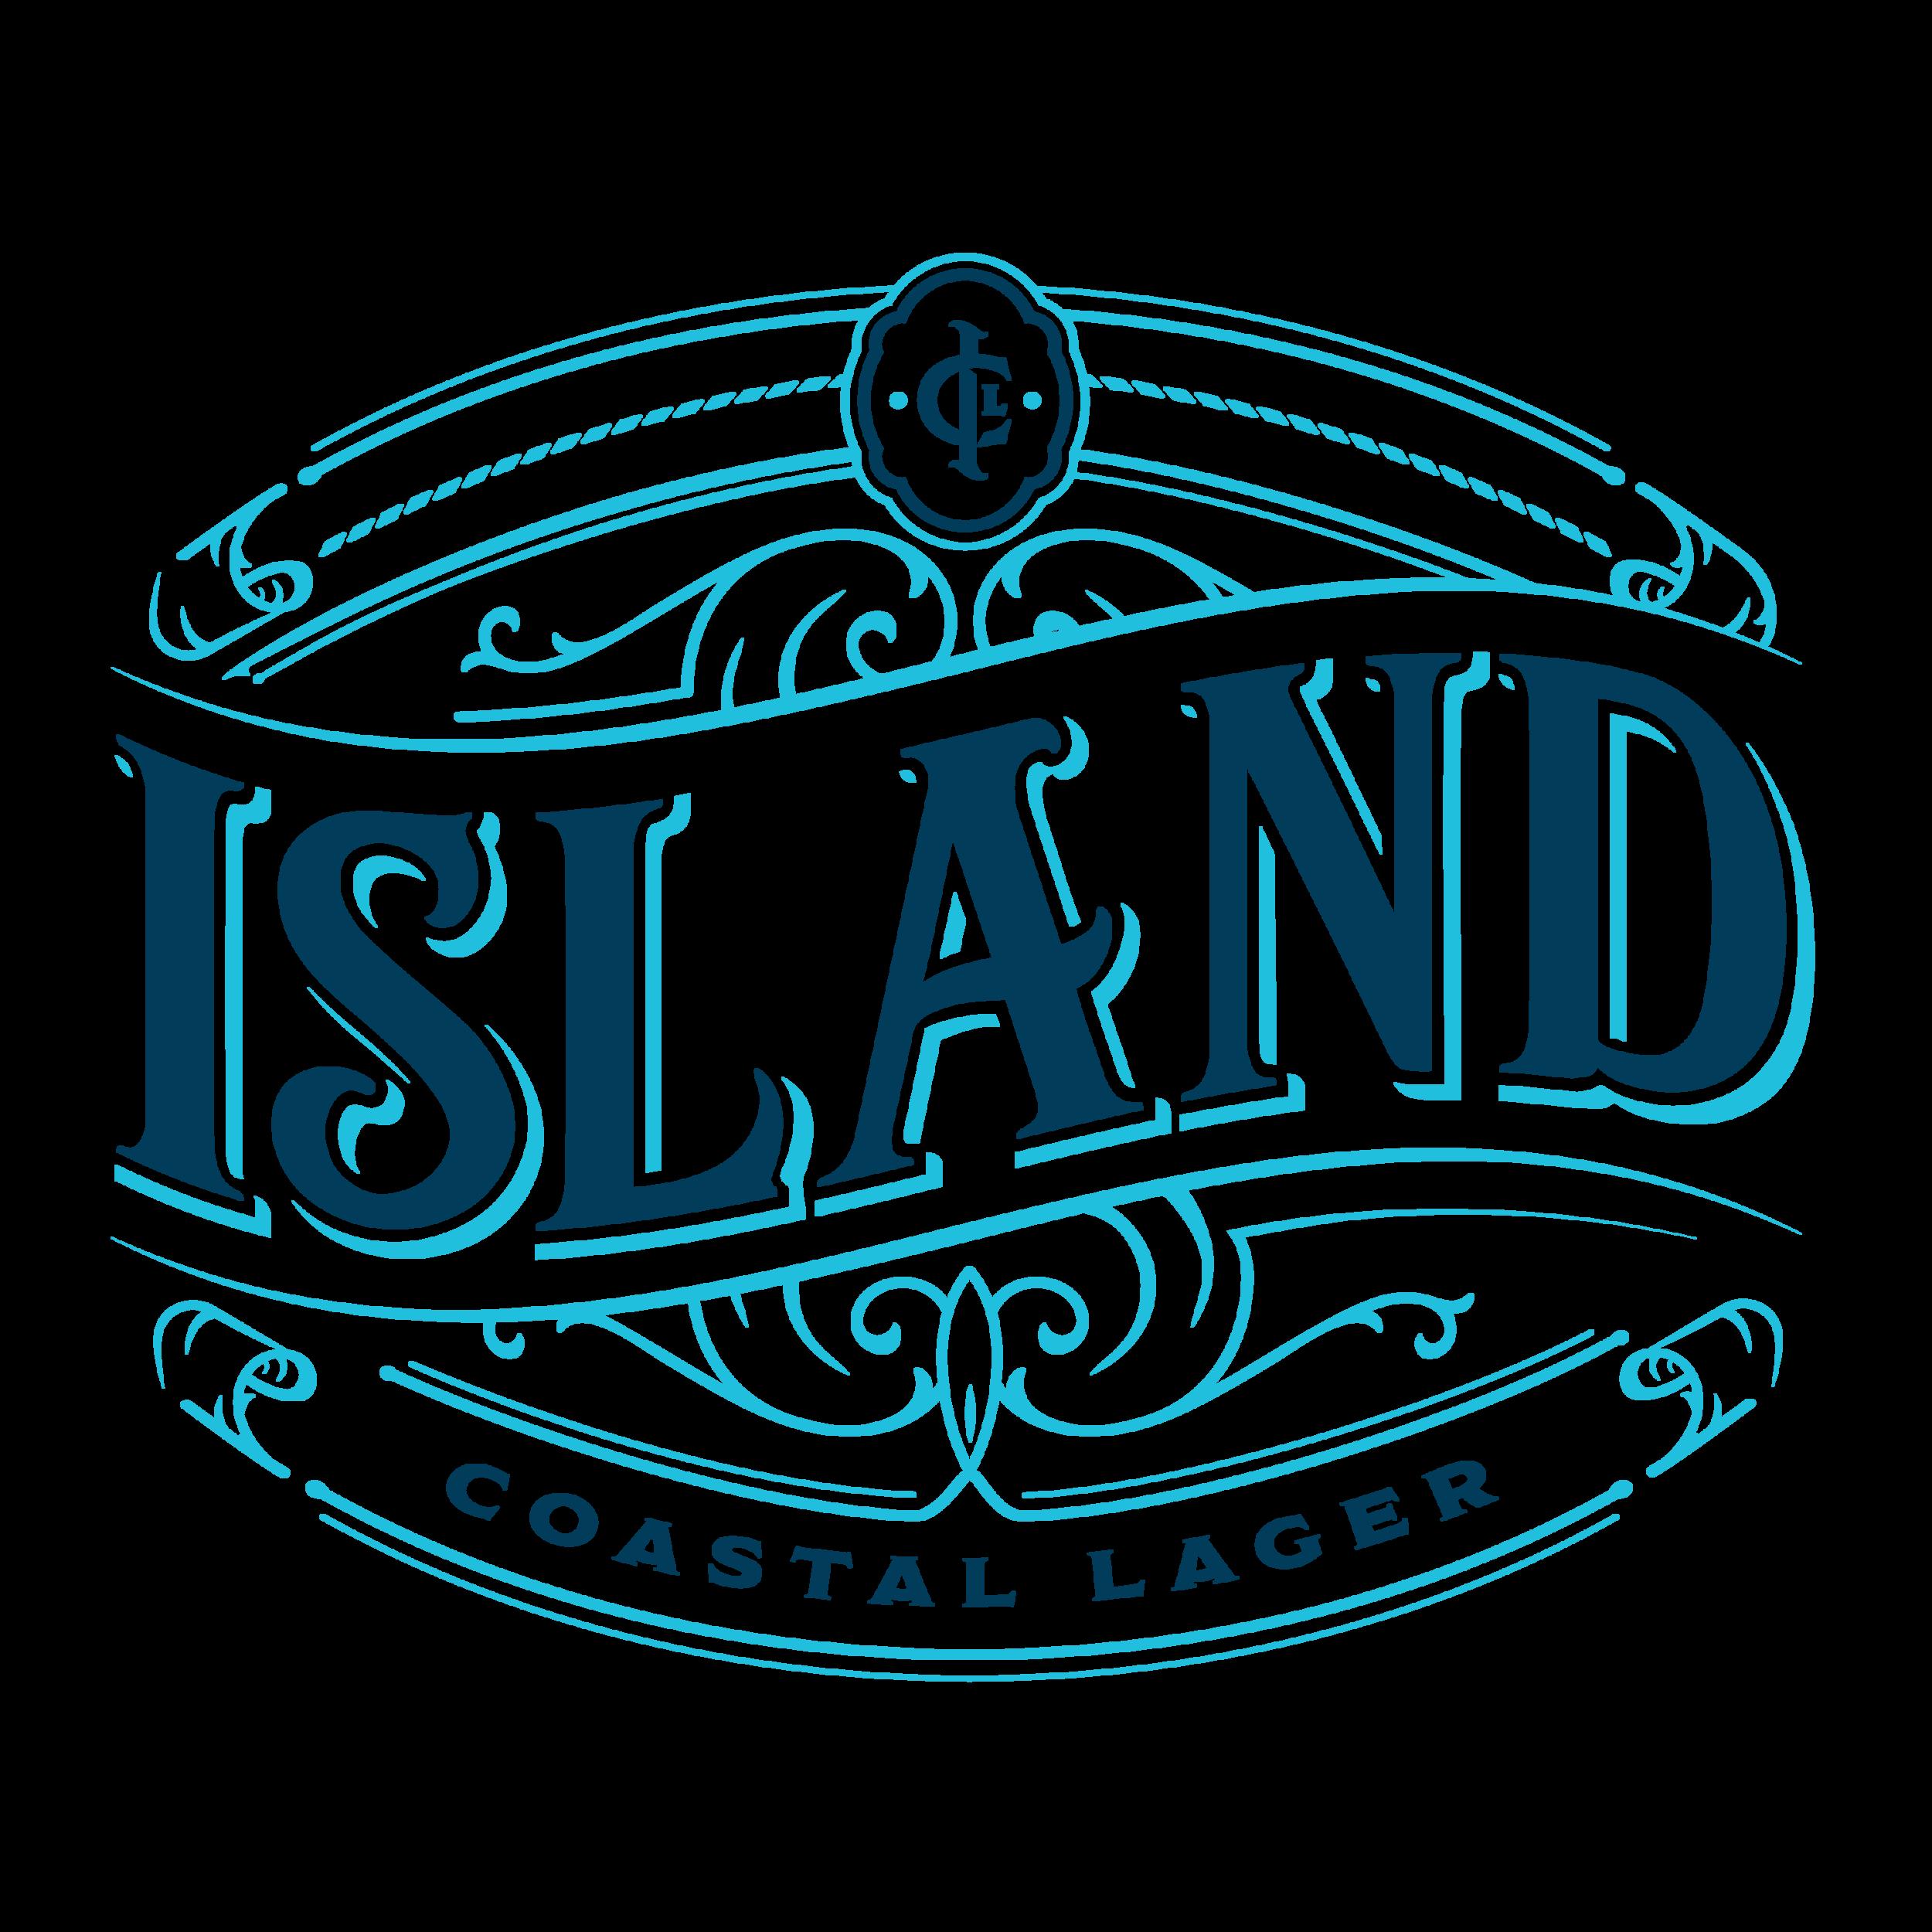 Island Coastal Lager Logo (1).png